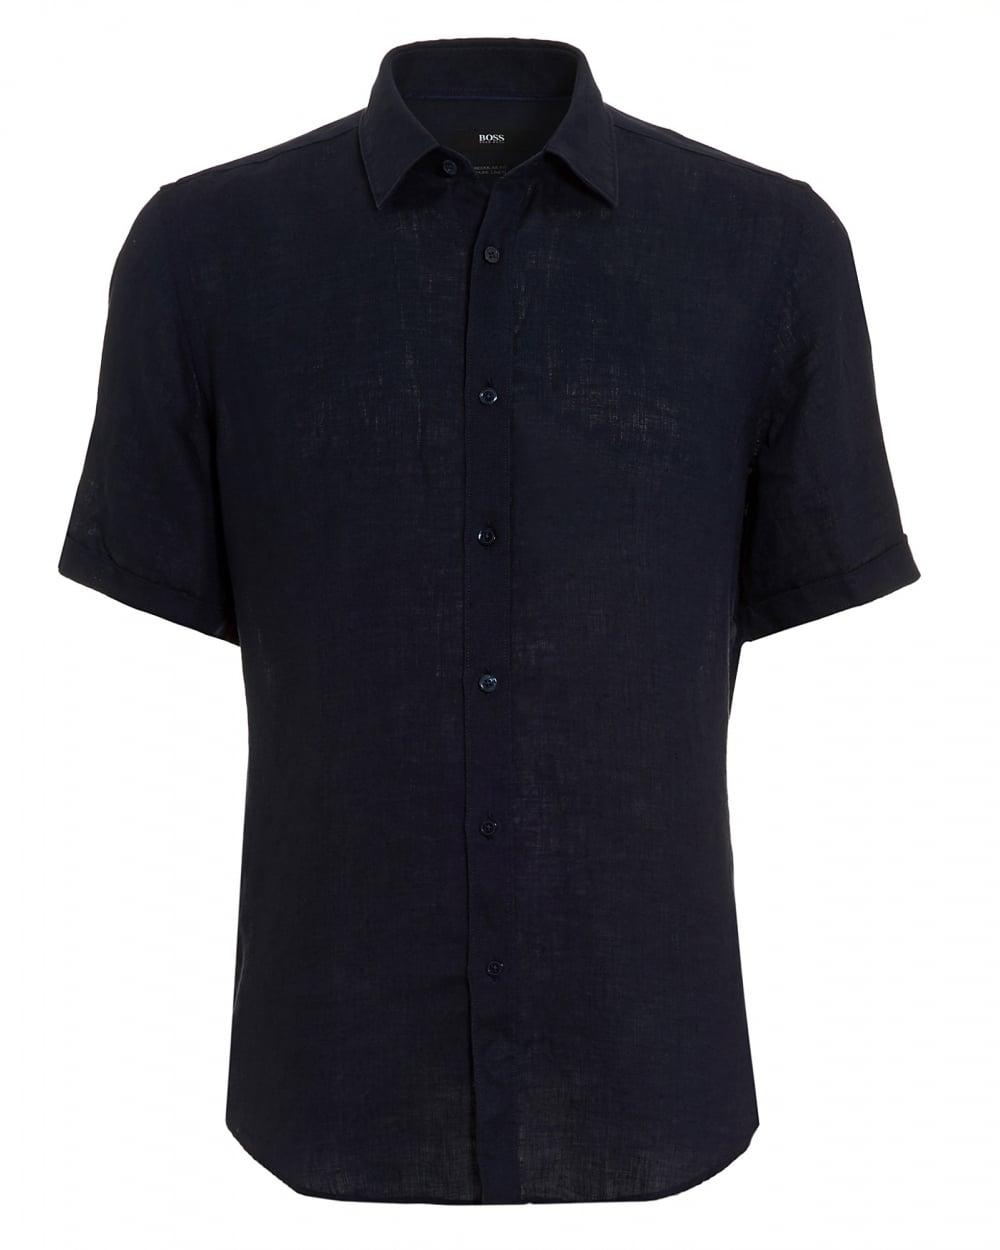 Mens Luka Linen Navy Blue Short Sleeved Shirt